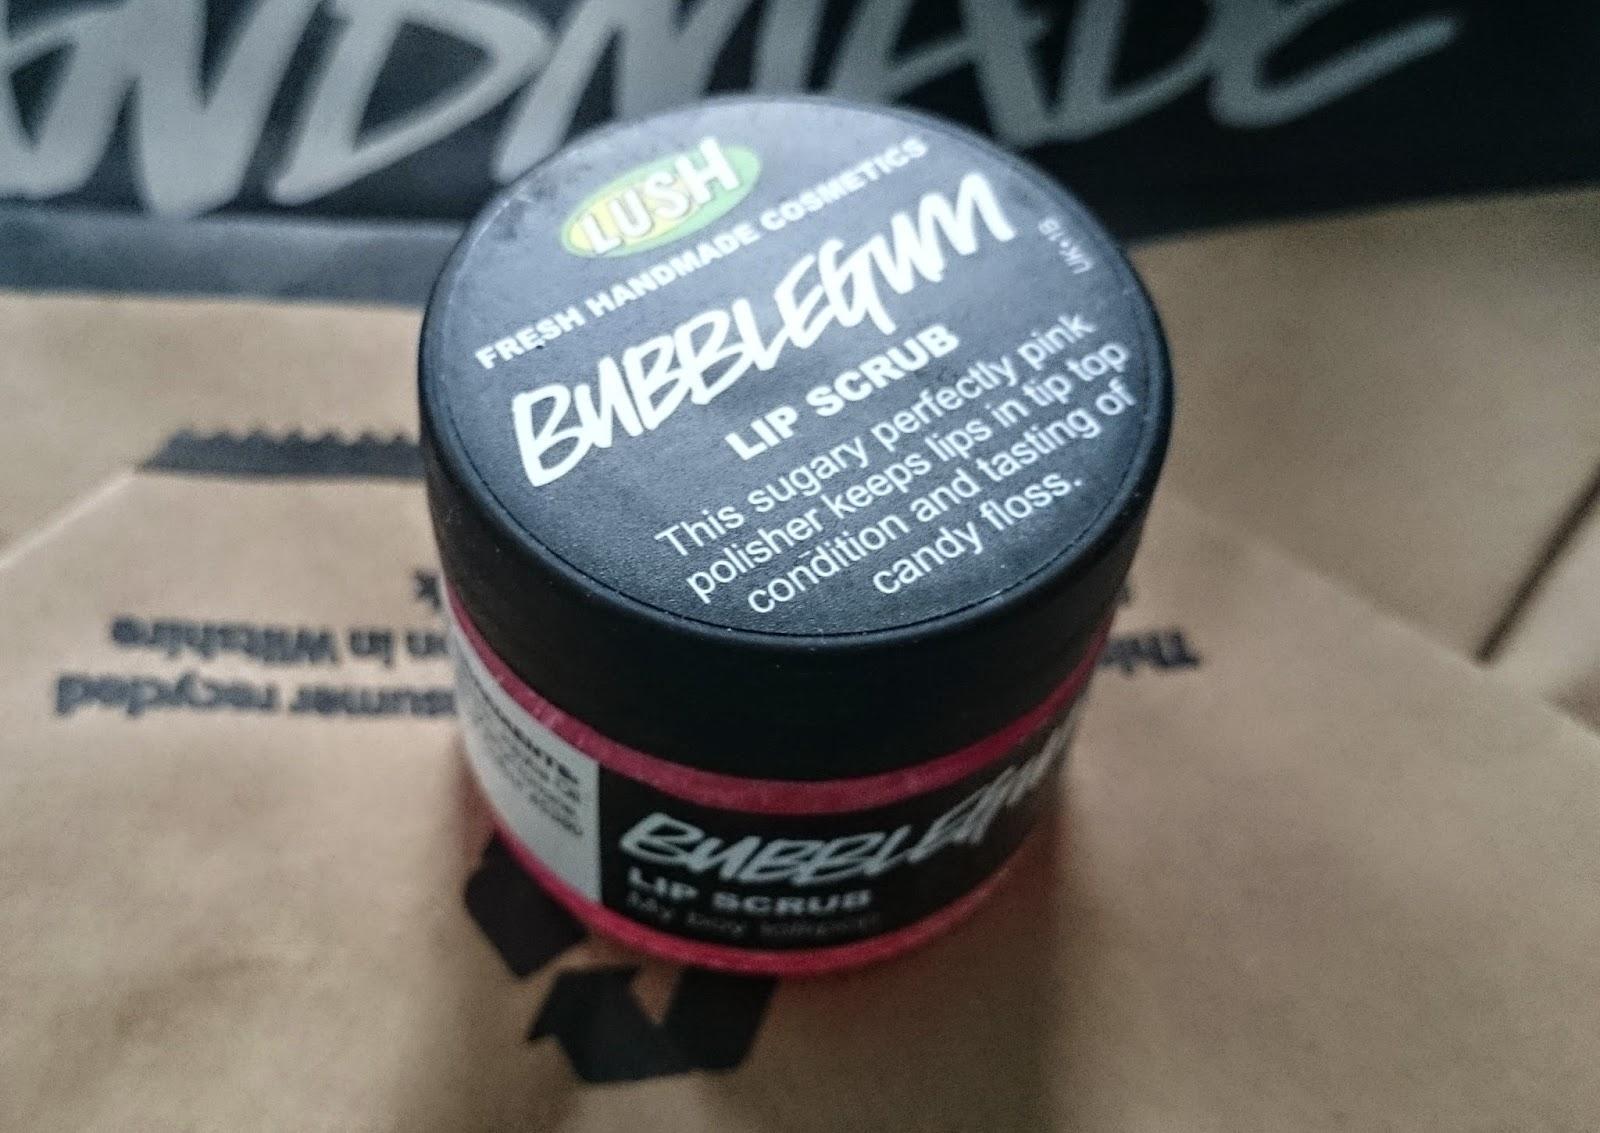 lush cosmetics haul bath bomb ballistic bubblegum lip scrub bubbleroom